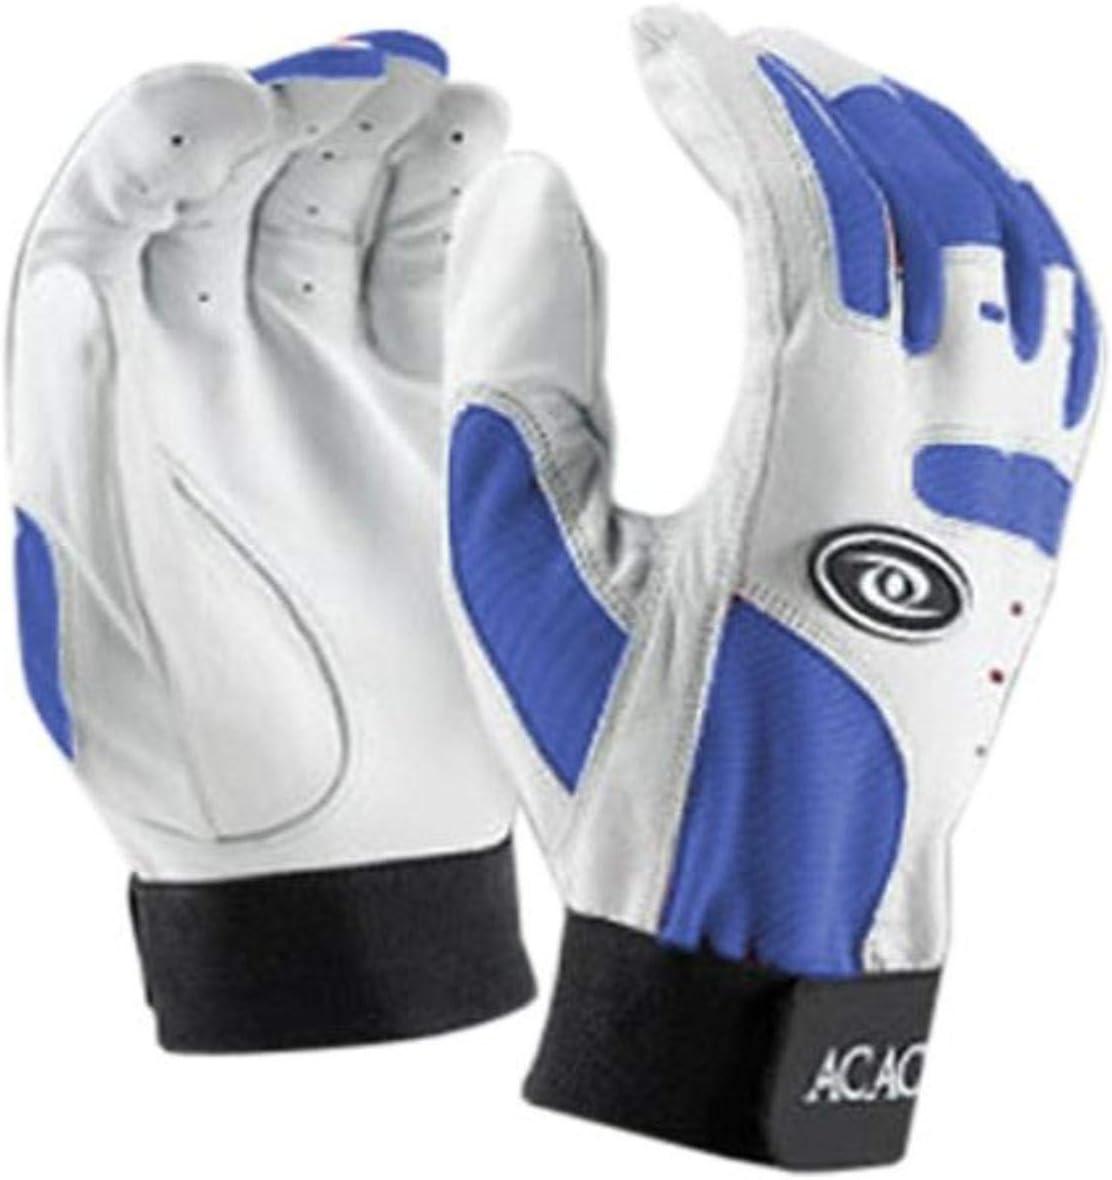 ACACIA Home Run Baseball Batting Gloves, White/Royal, Adult Medi